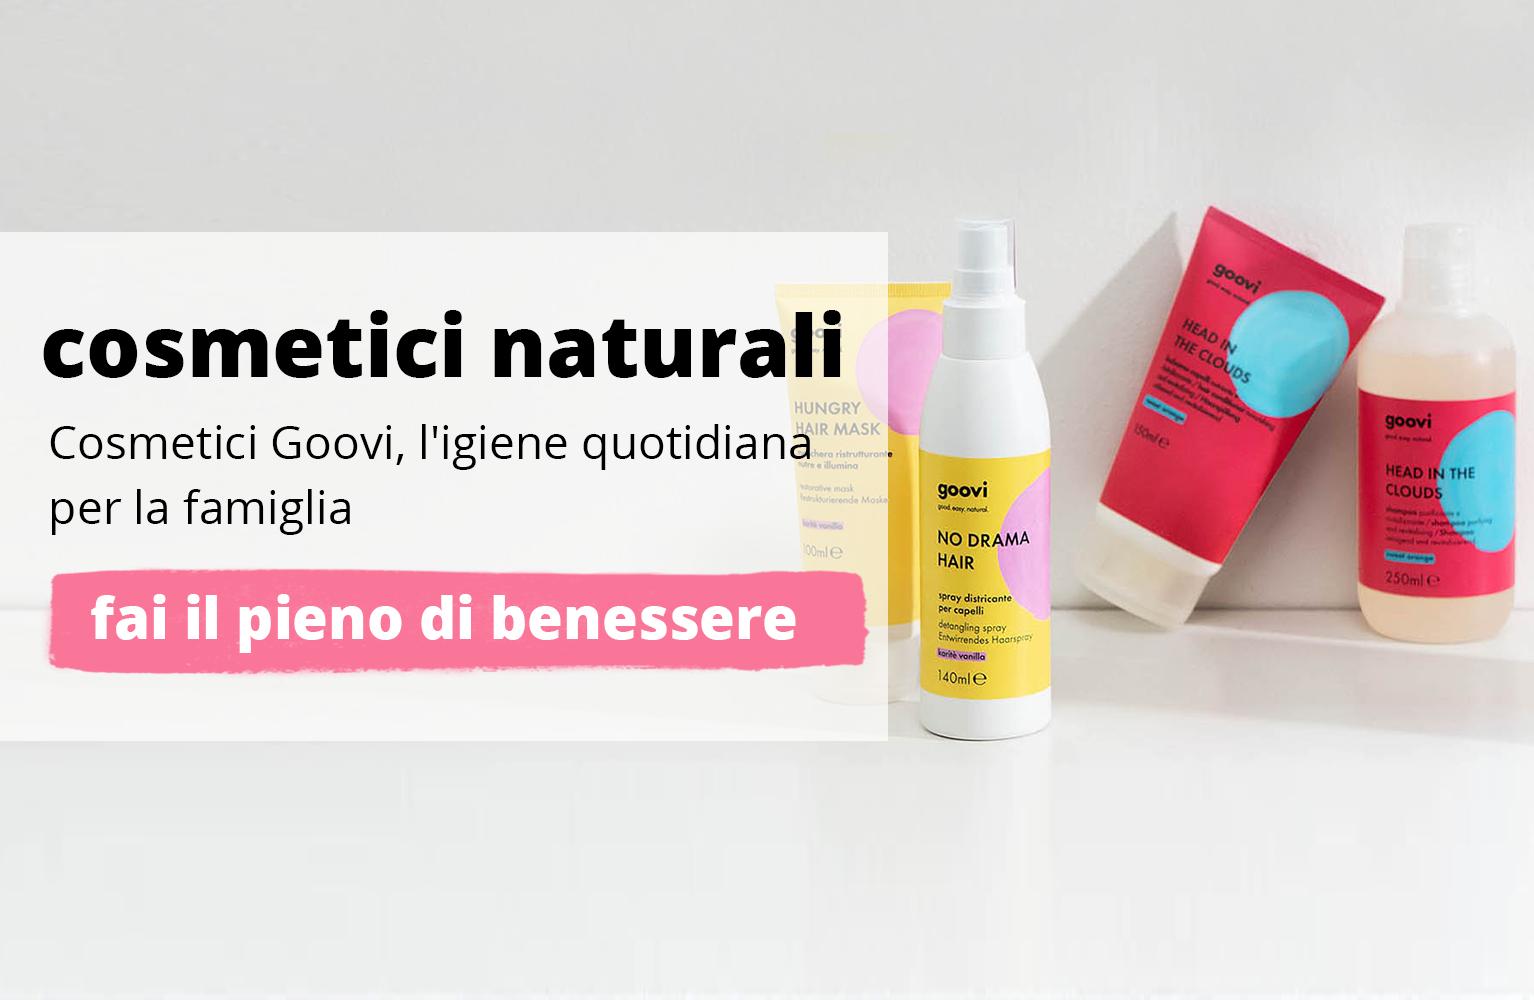 cosmetici naturali goovi